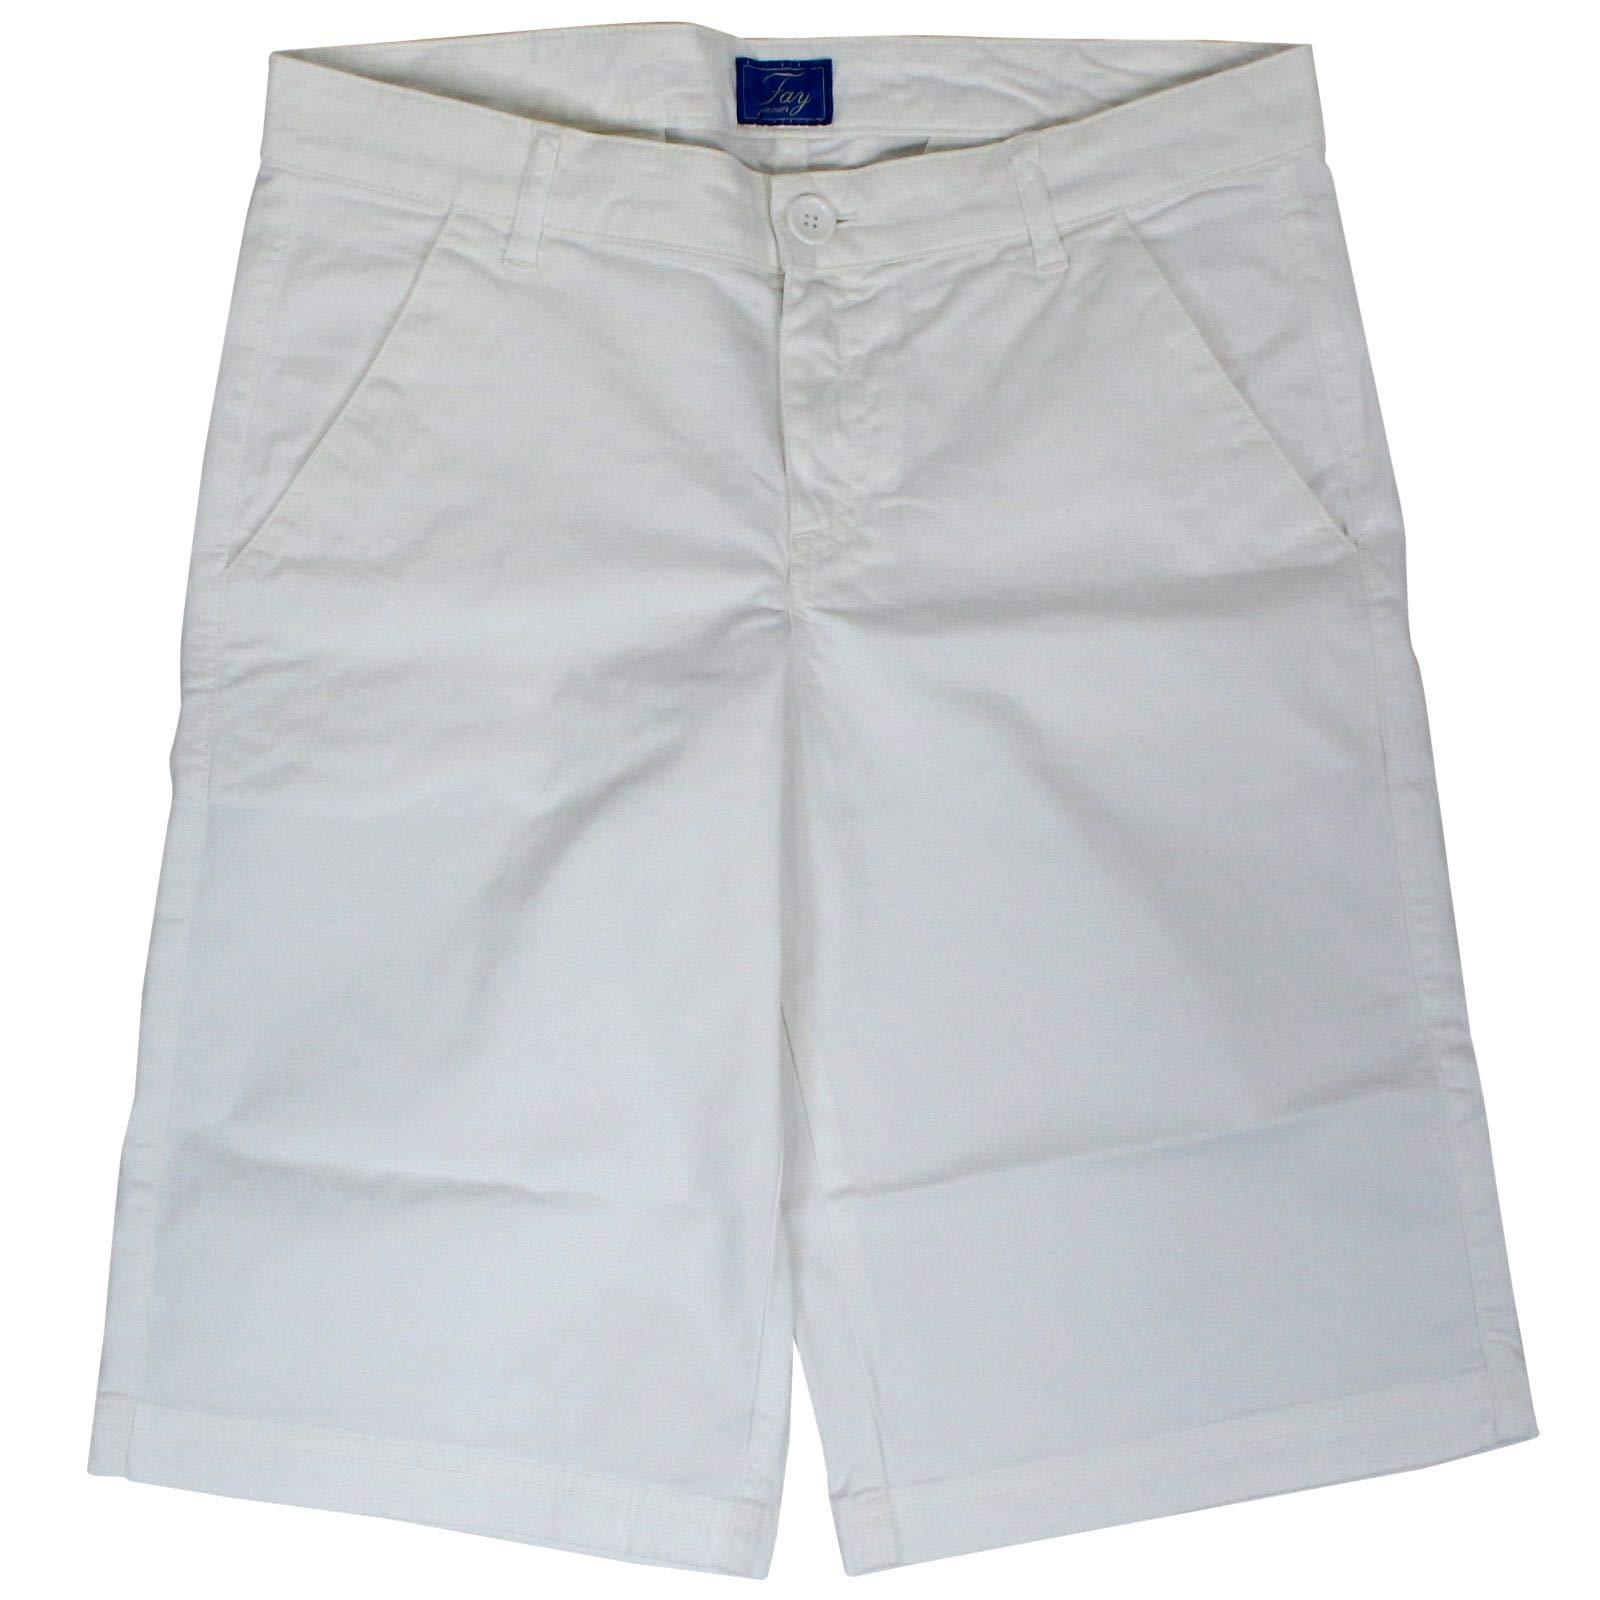 fay Boys Nui8338736tqpsb001 White Cotton Pants